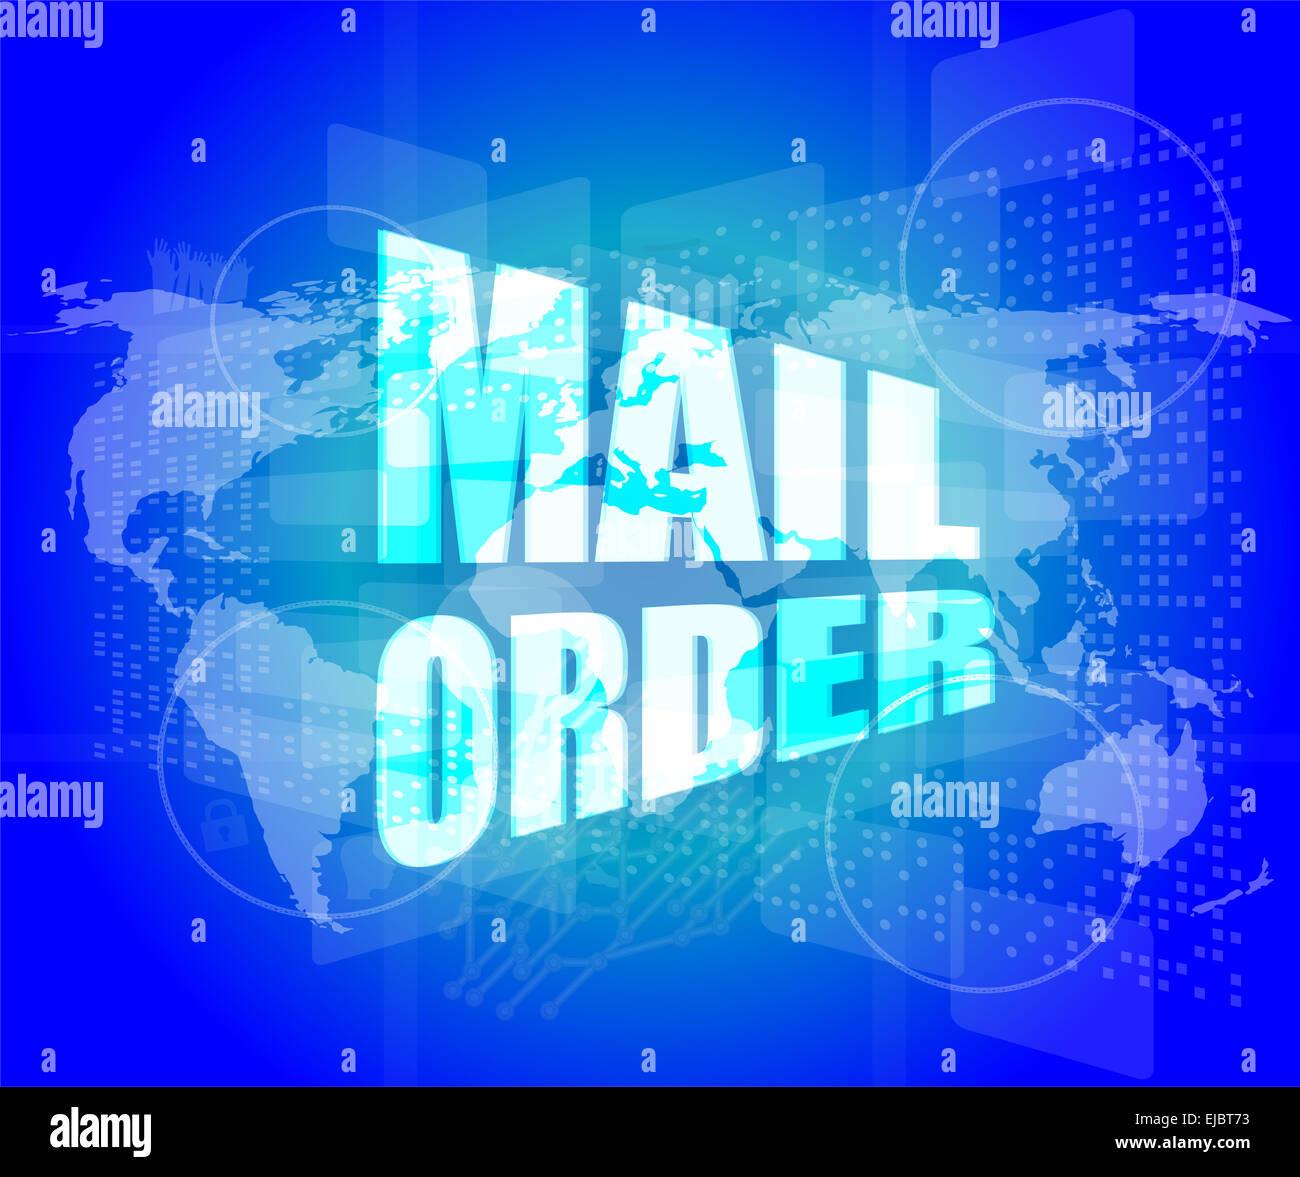 Mail order words on digital screen background with world map stock mail order words on digital screen background with world map gumiabroncs Choice Image